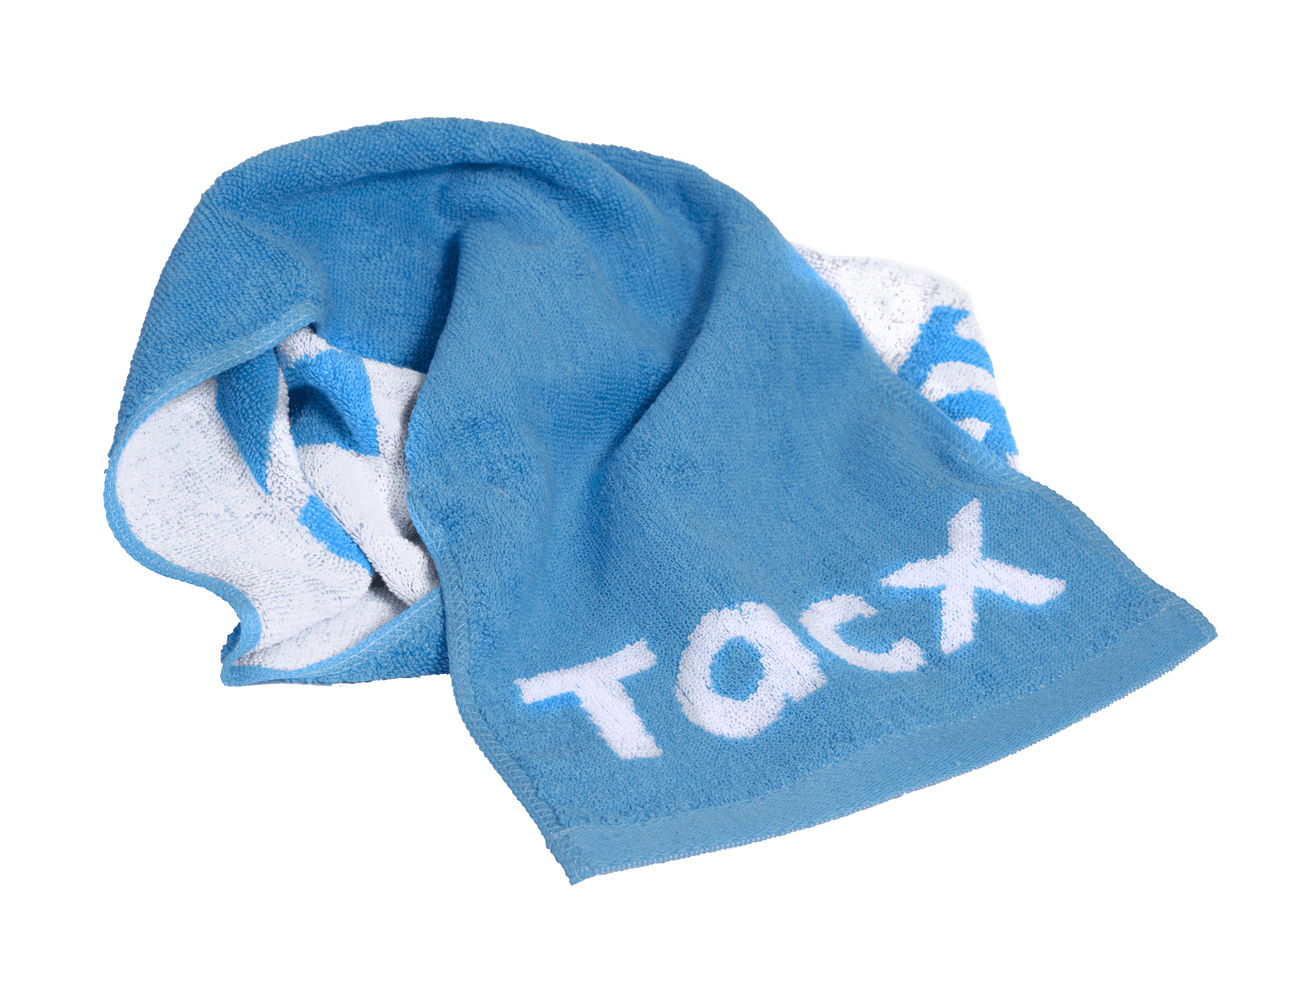 Tacx Håndklæde - 69,00 | Misc. Multimedia